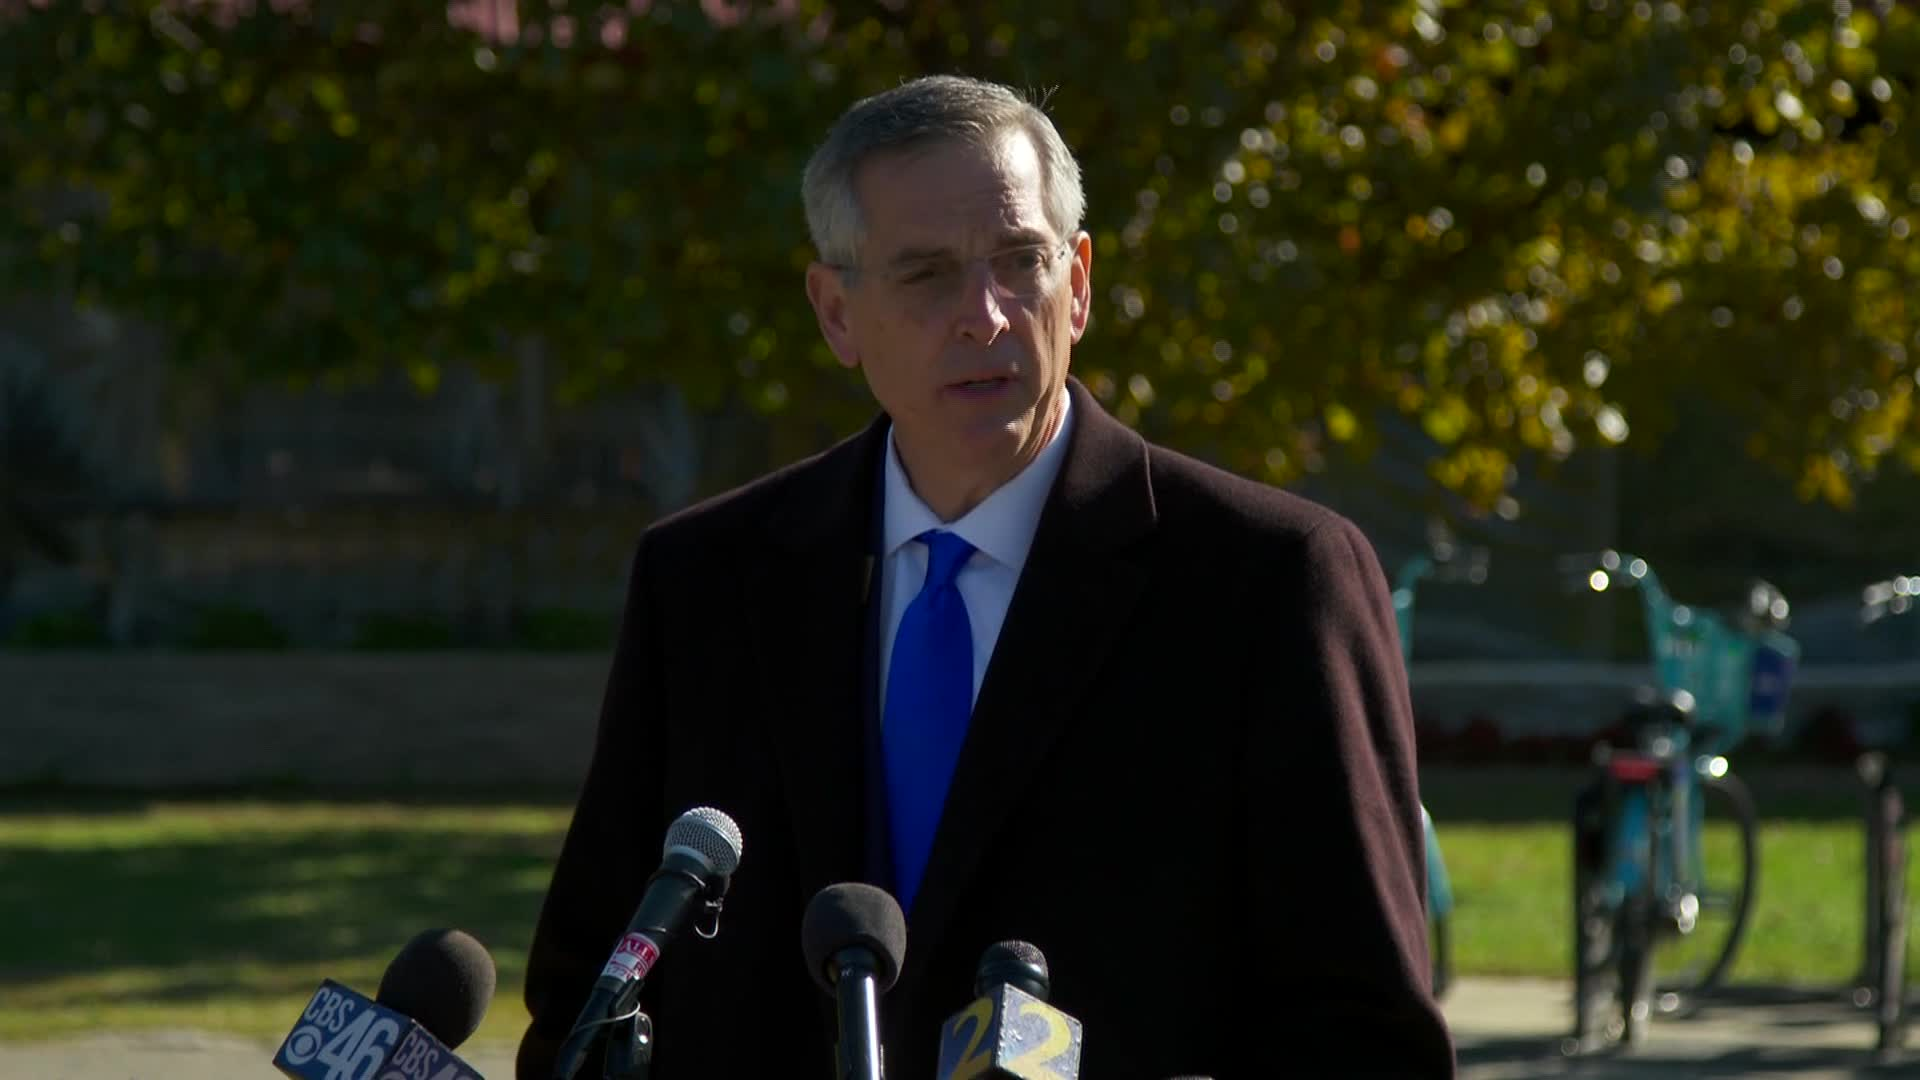 Georgia Secretary of State Brad Raffensperger speaks during a press conference in Atlanta on November 2.